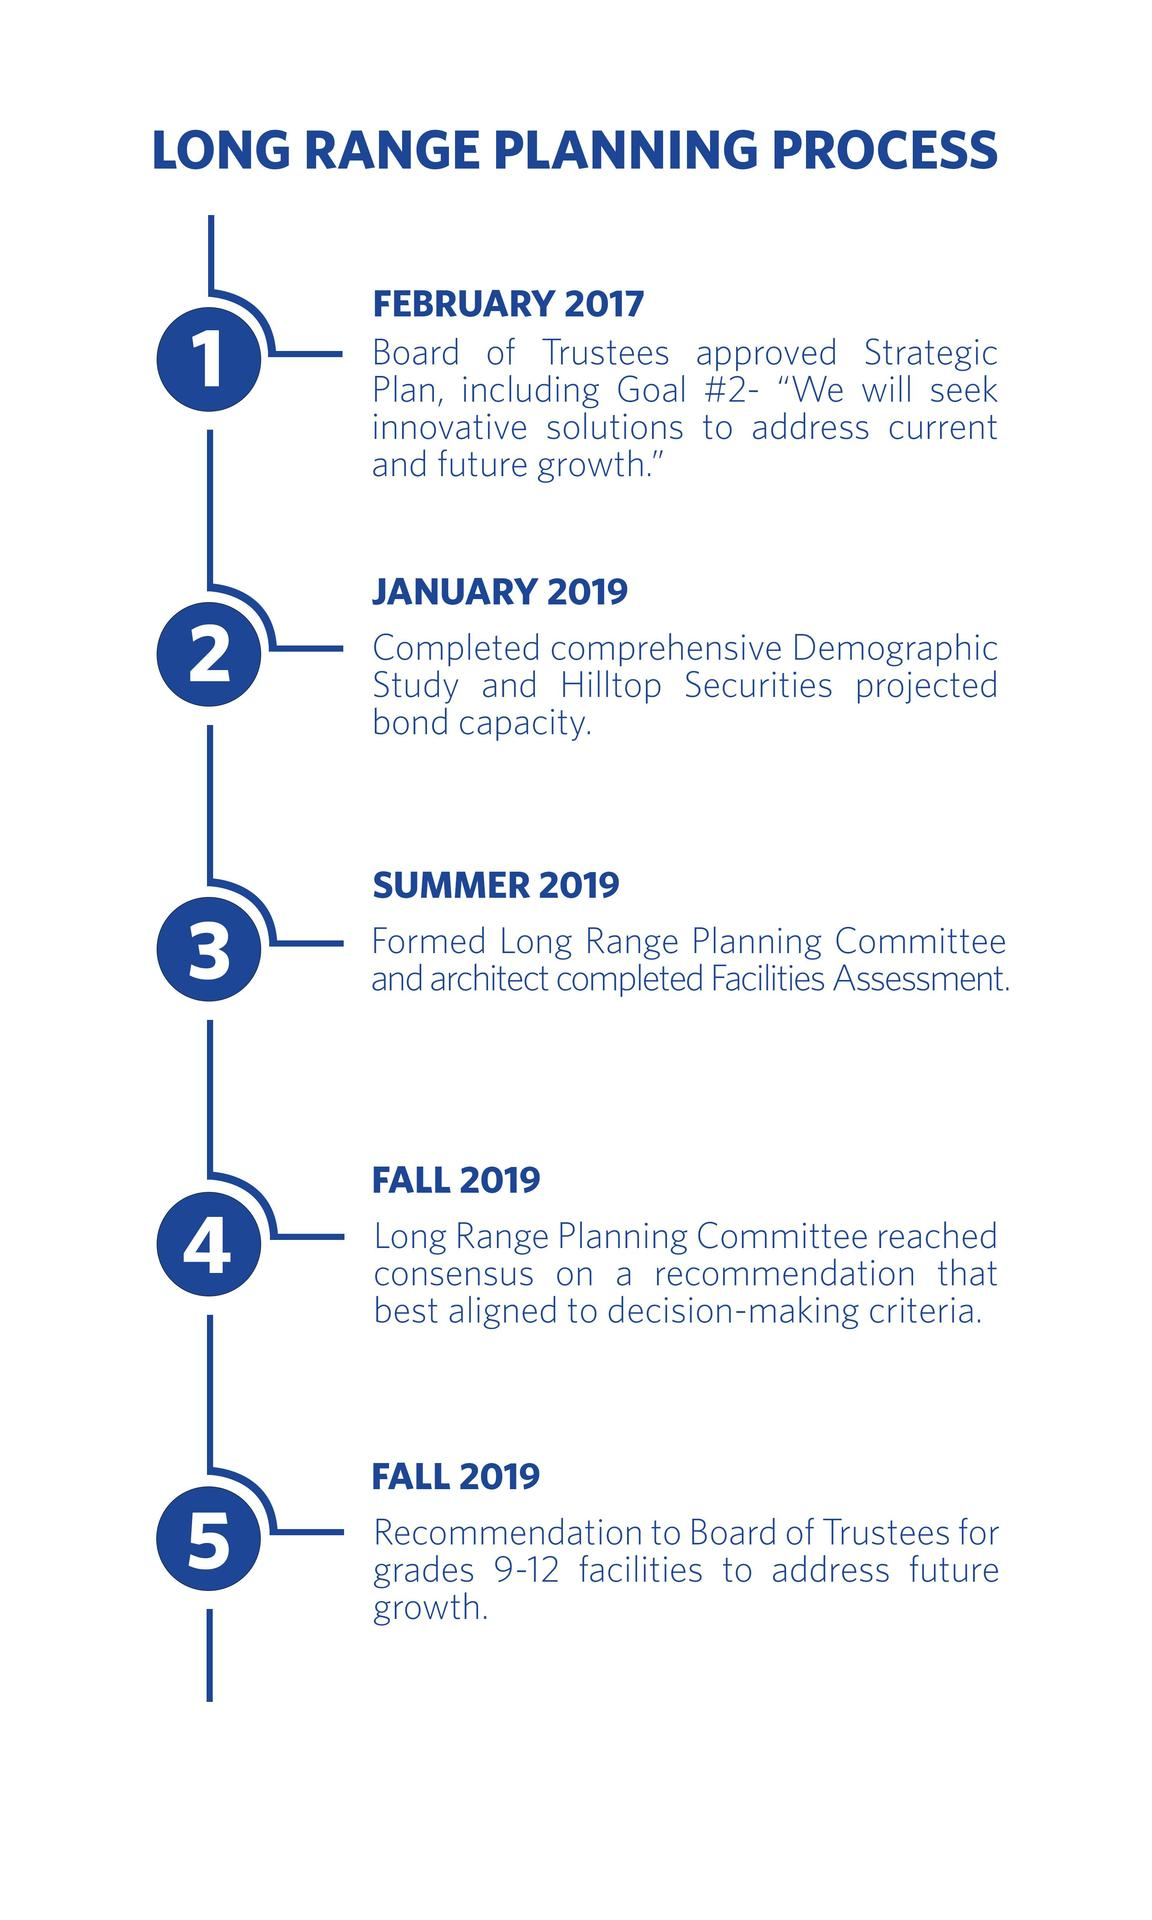 planning process timeline